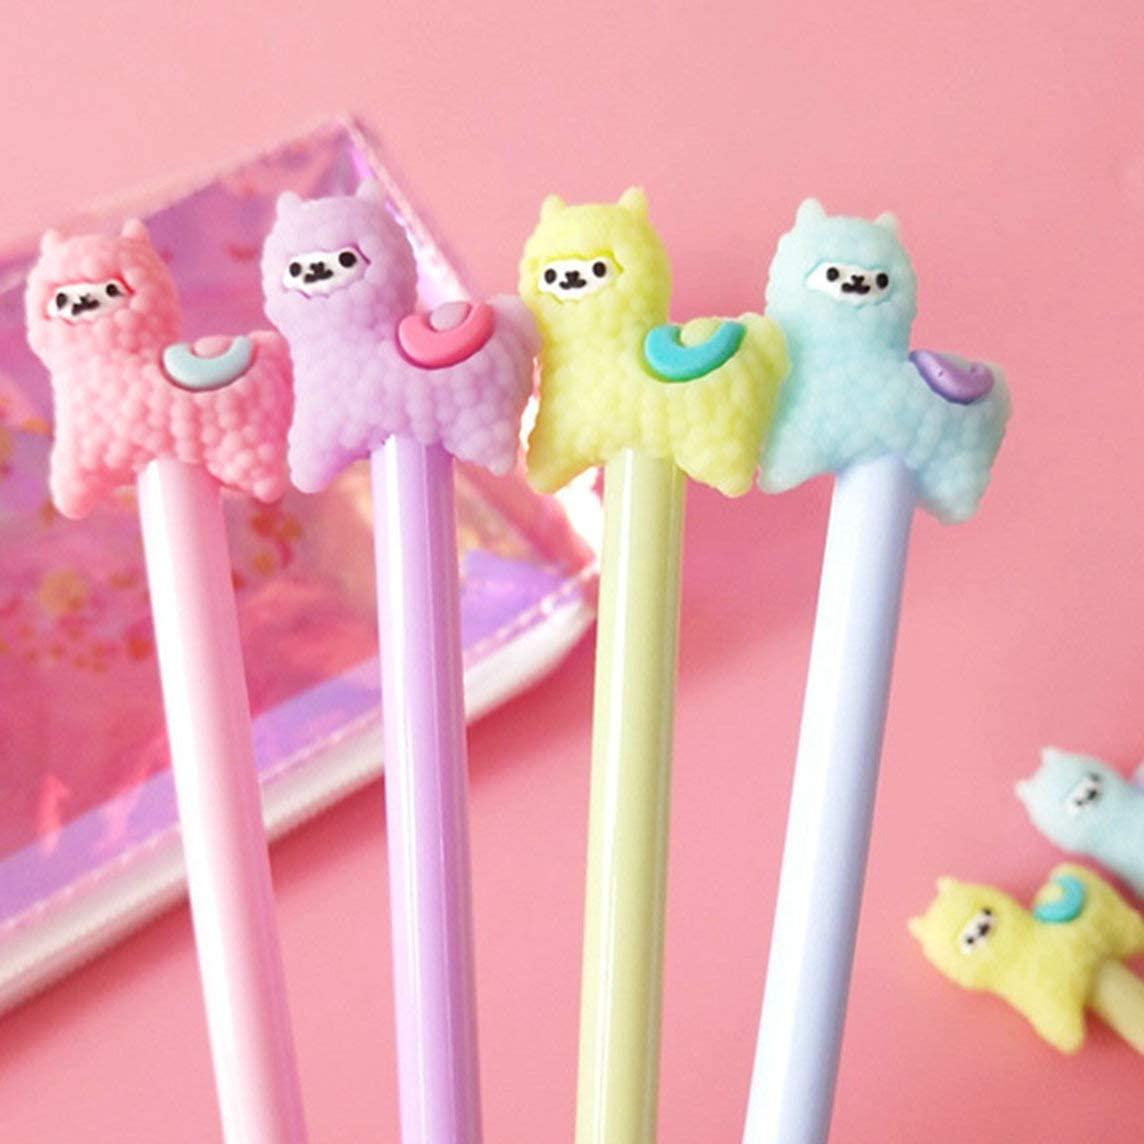 WIN-MARKET Animal Llama Sheep Alpaca Gel Pens Set Fashion Cute Colorful Kawaii Lovely Gel Ball Pens Office School Stationery pen(5PCS)